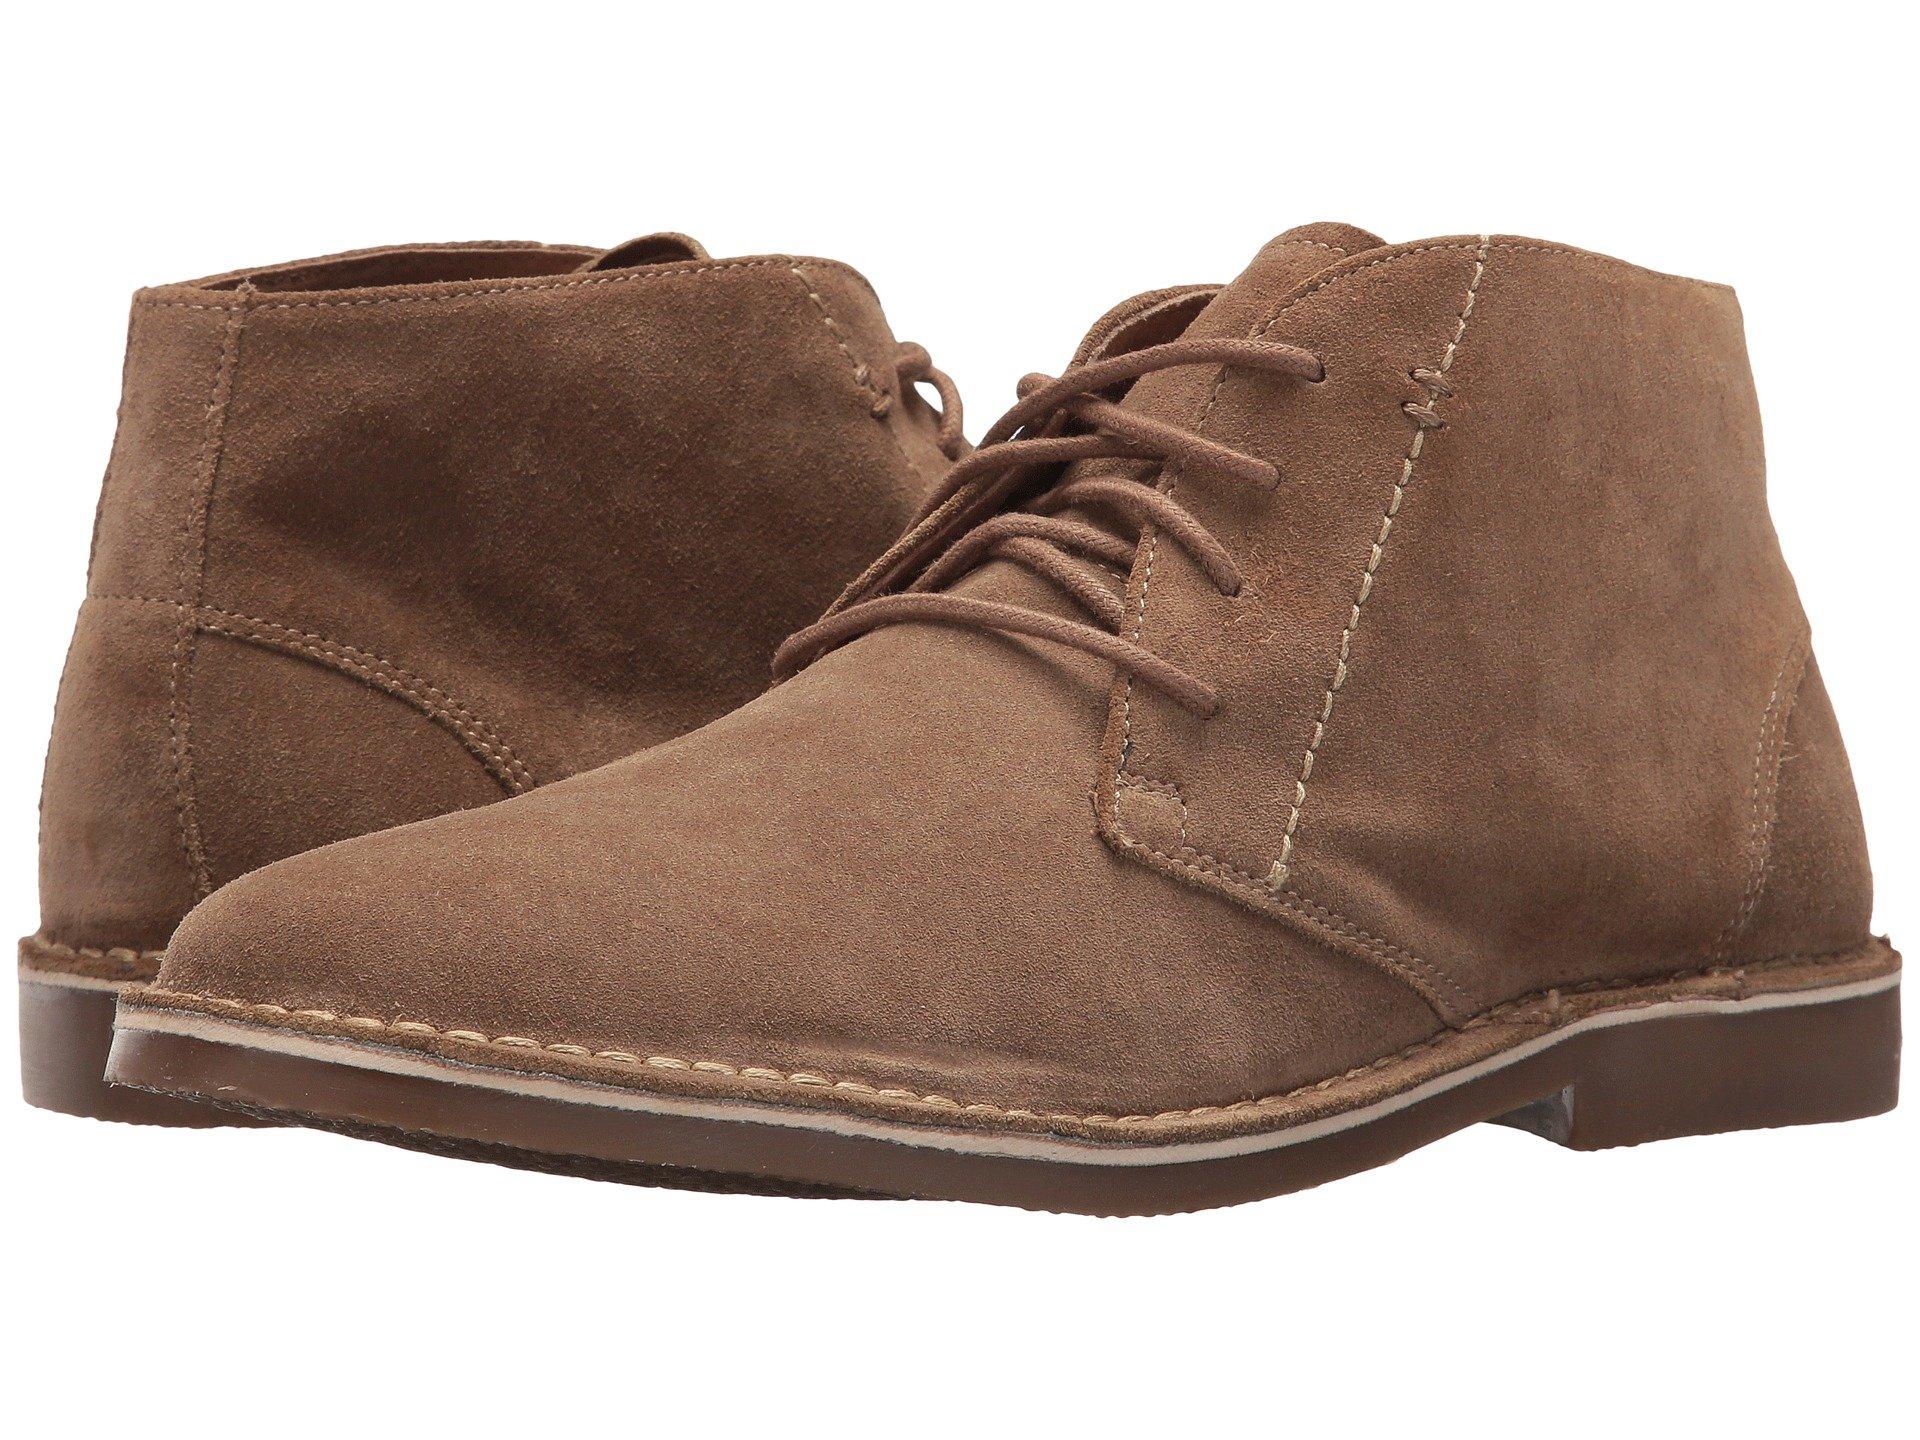 Galloway Plain Toe Chukka Boot